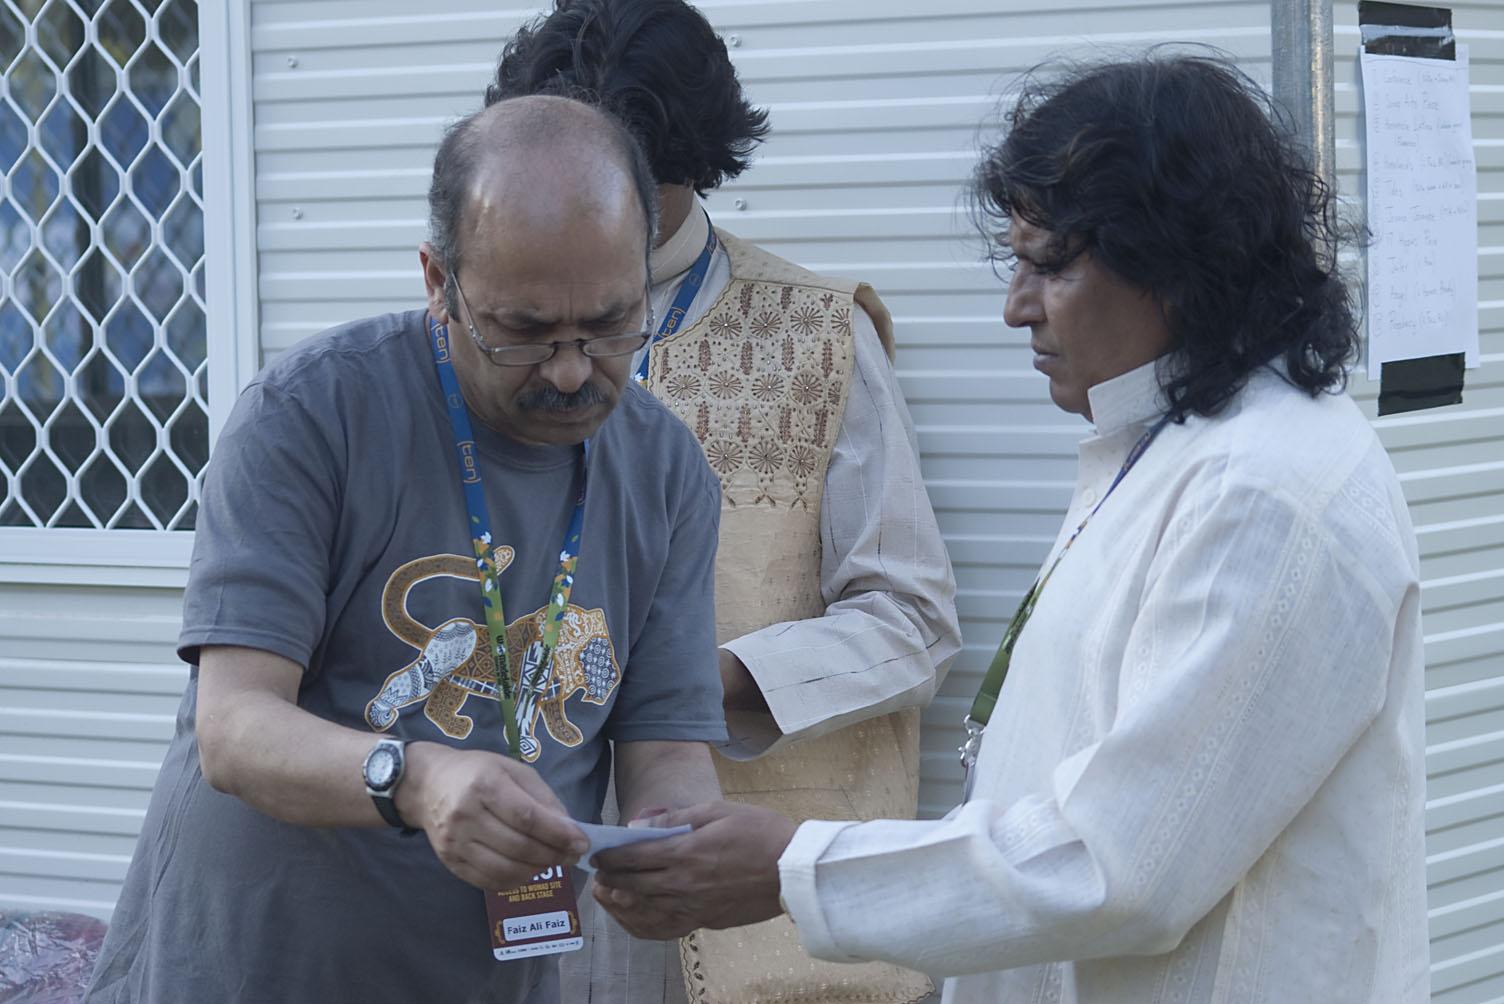 WOMADelaide_All-Star_Gala_set-up_20110314_16_Yasser_Nomann_+_Faiz_Ali.jpg